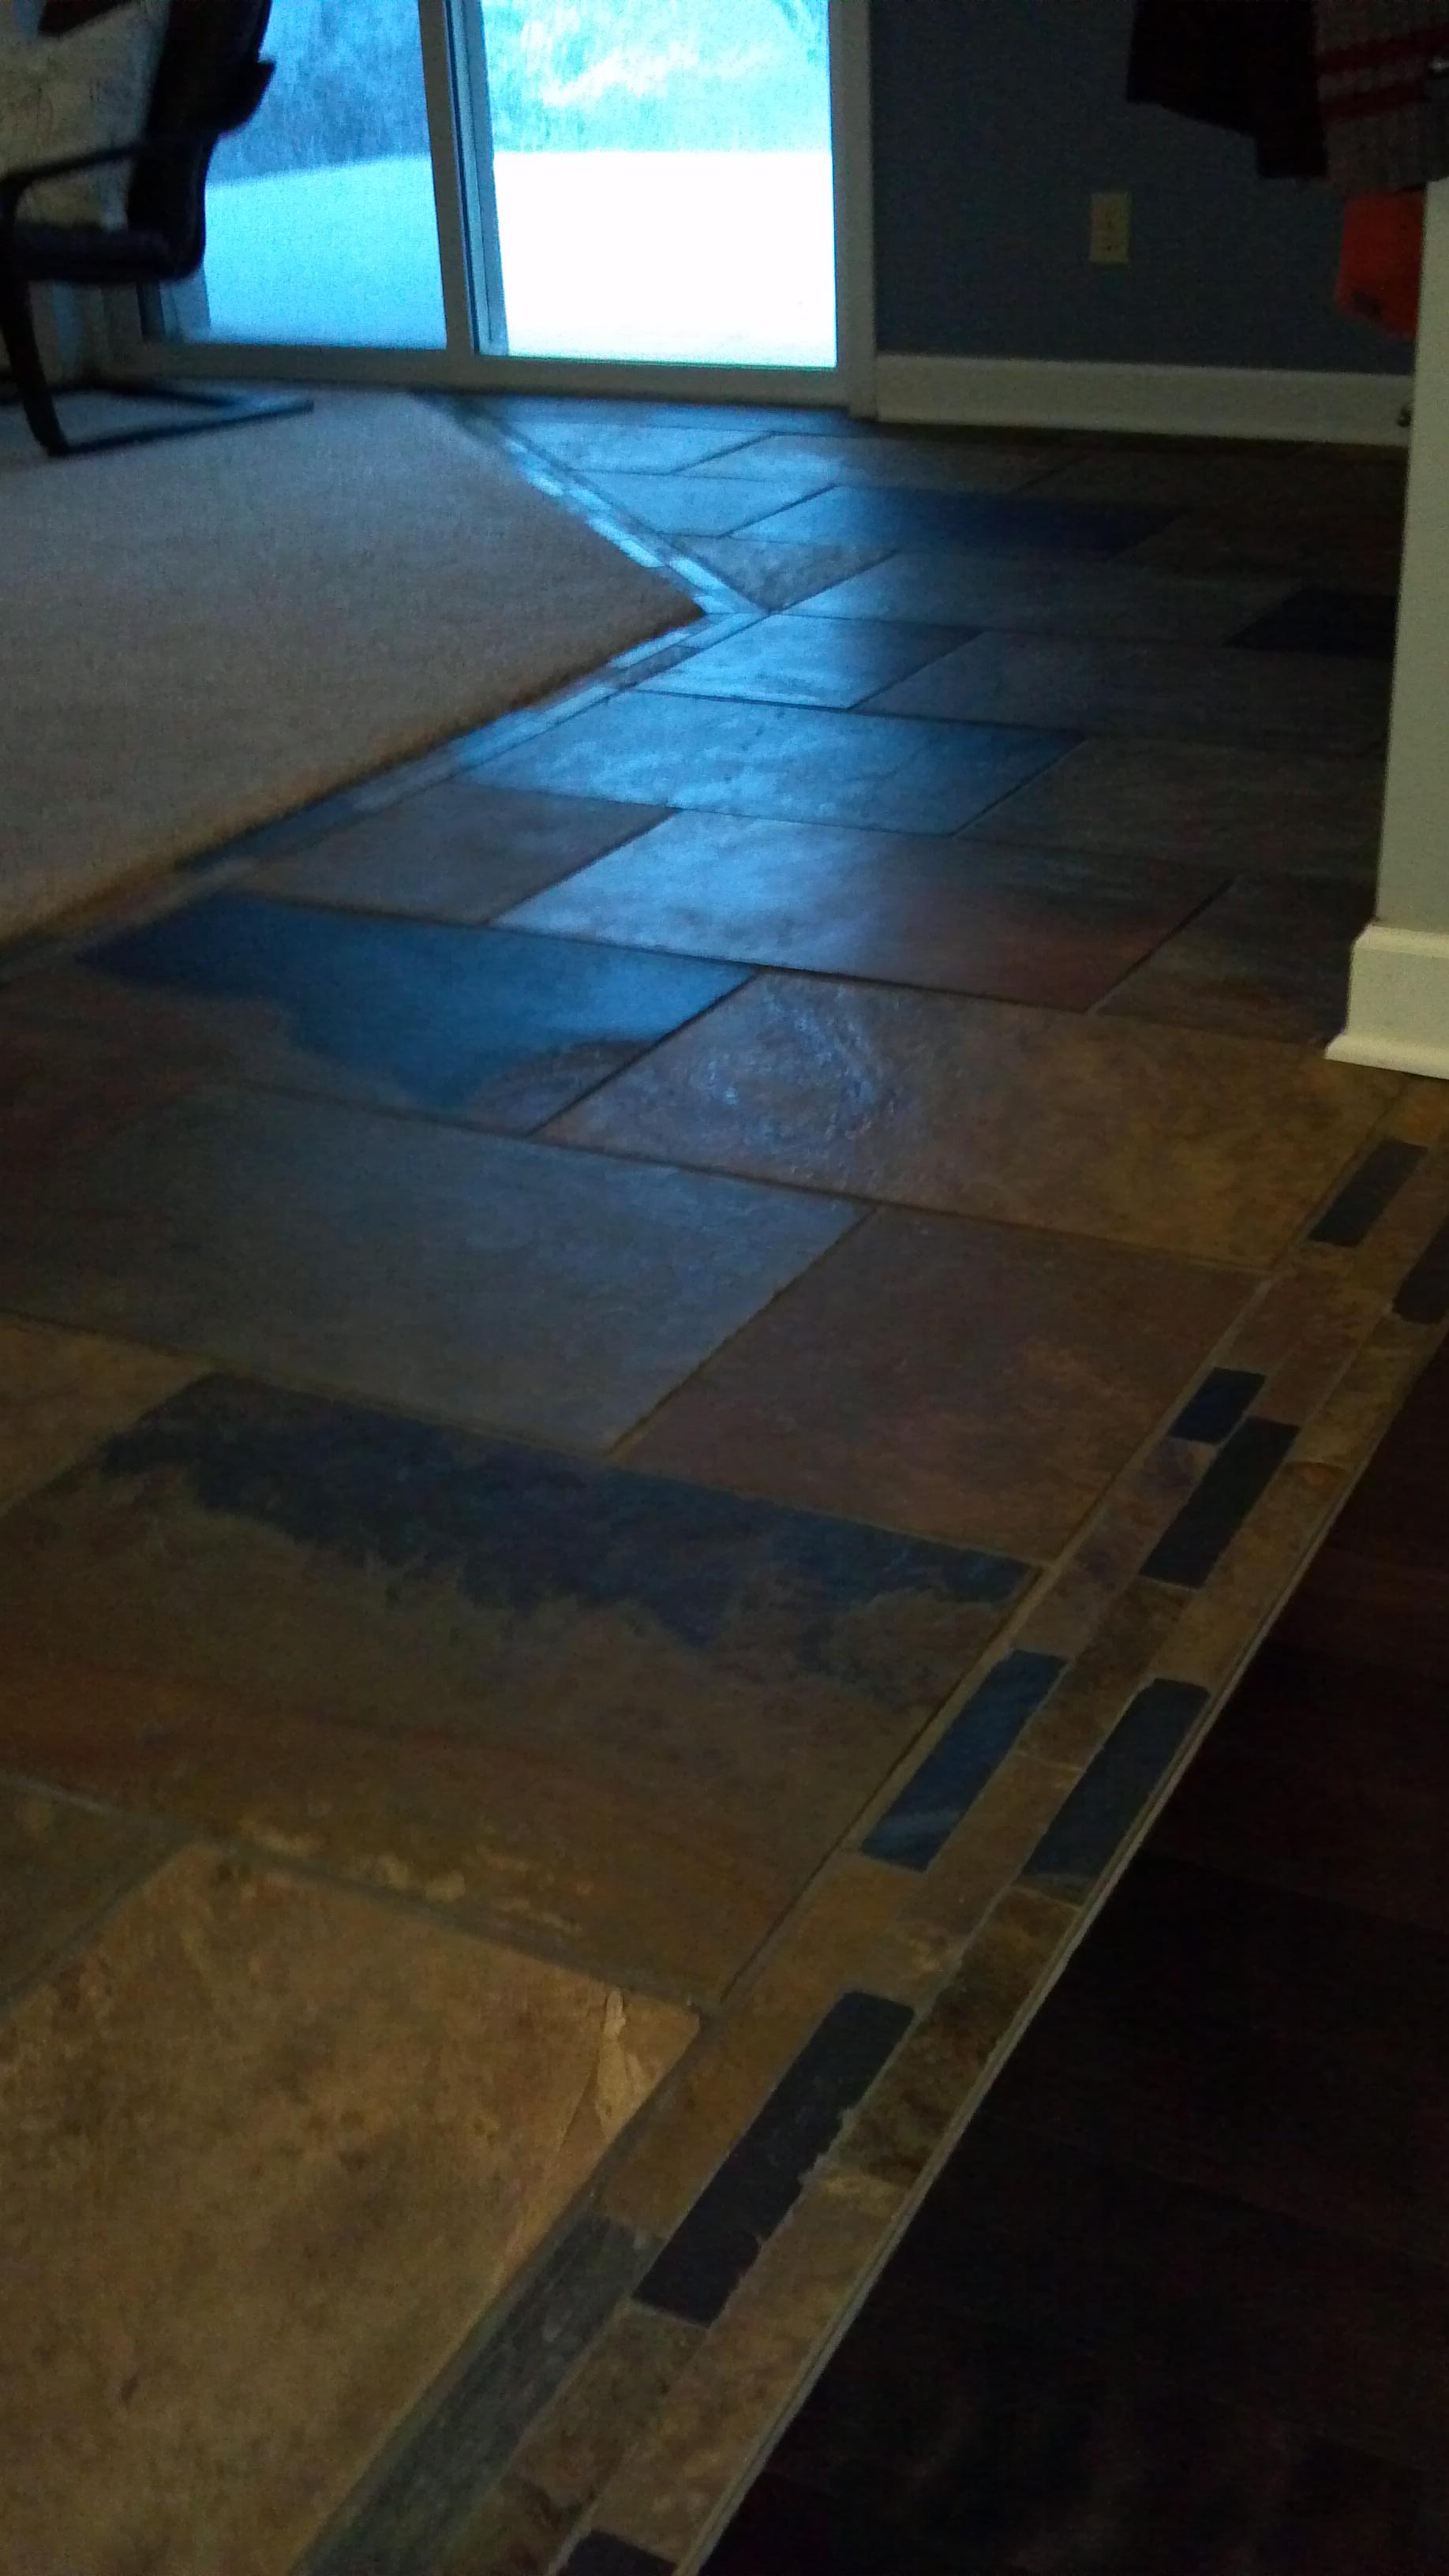 MDC 17 Slate Floor carpet int angle long view.jpg